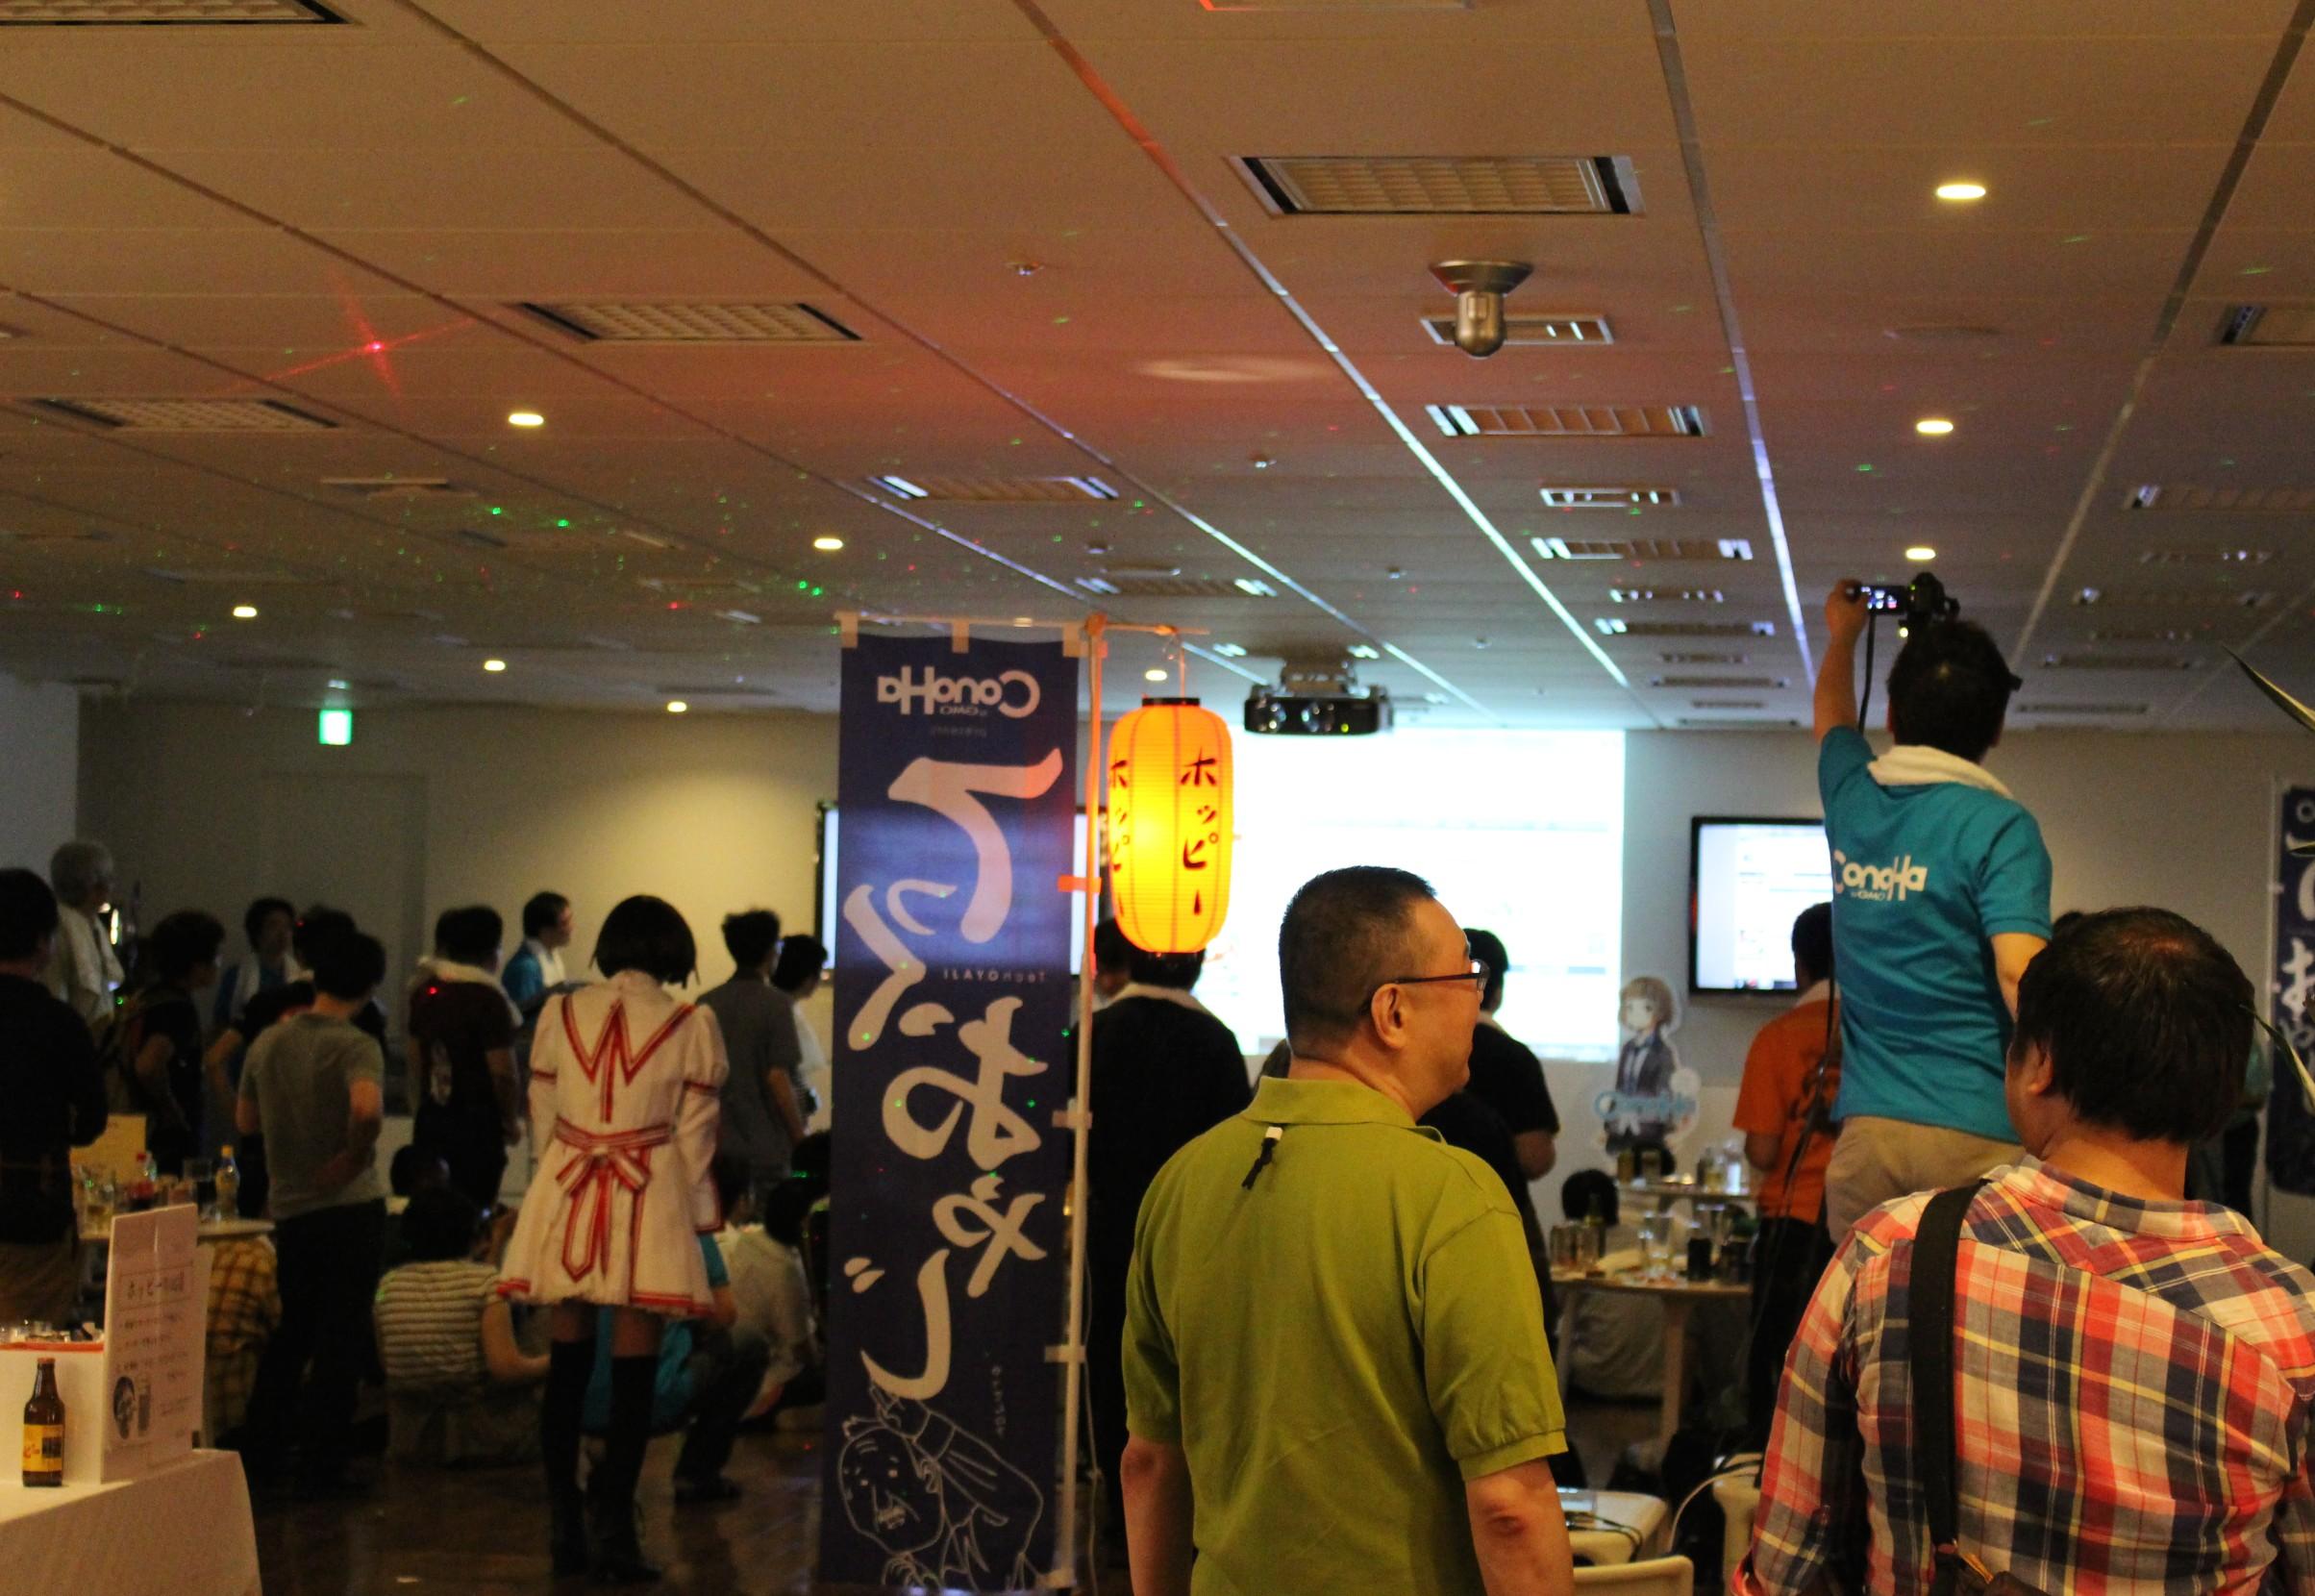 TechOYAJI~ドキッ!おやじだらけのLT大会!に参加してきました #TechOYAJI